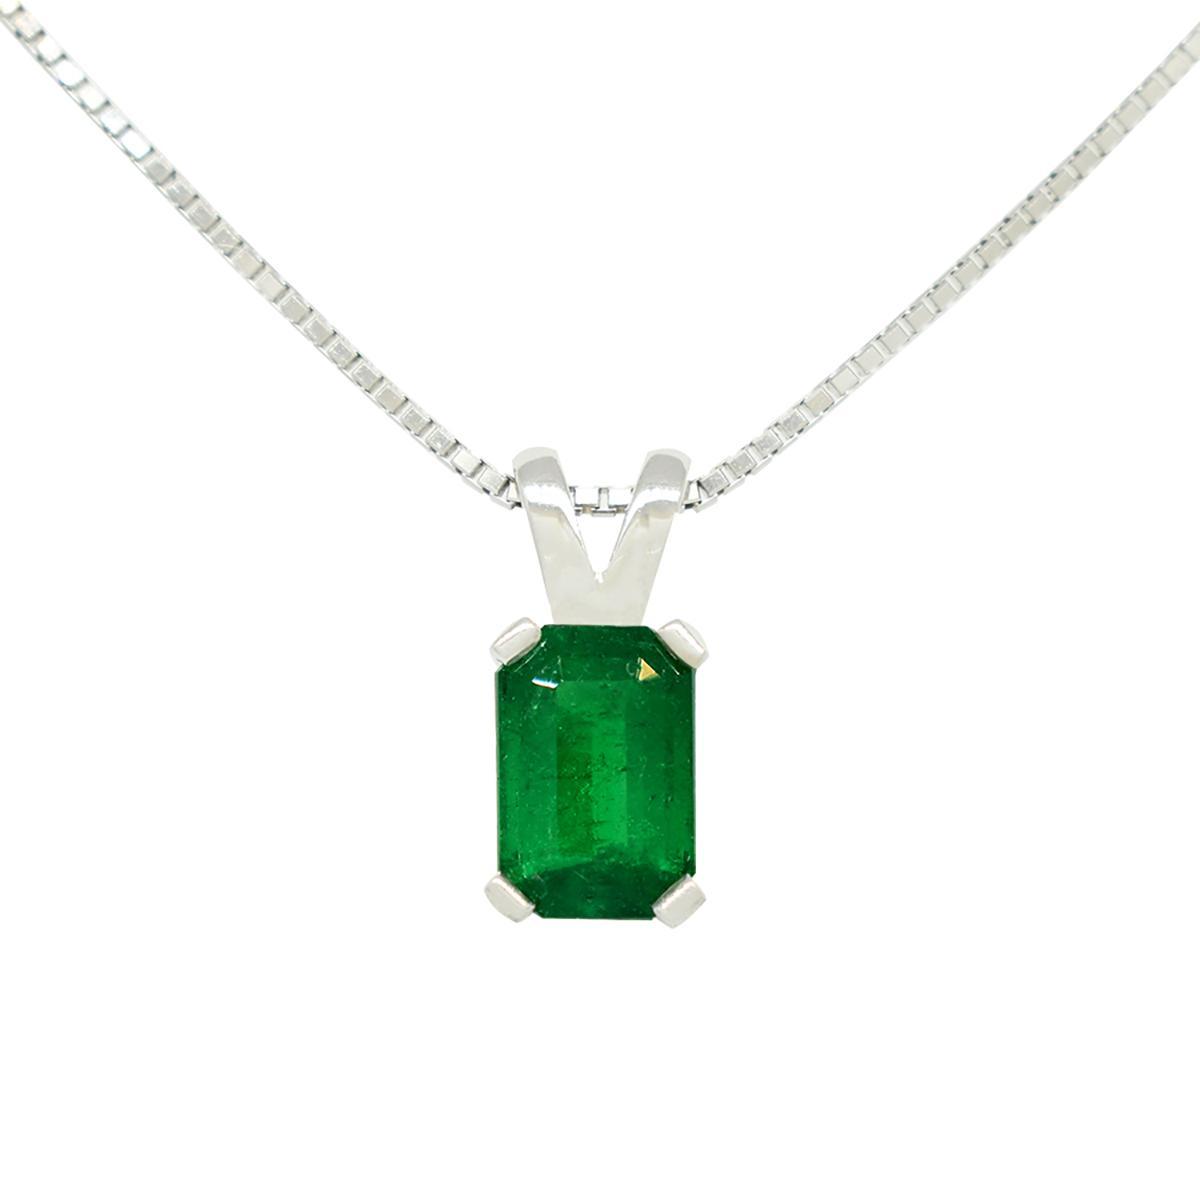 emerald-cut-emerald-set-in-18k-white-gold-solitaire-pendant